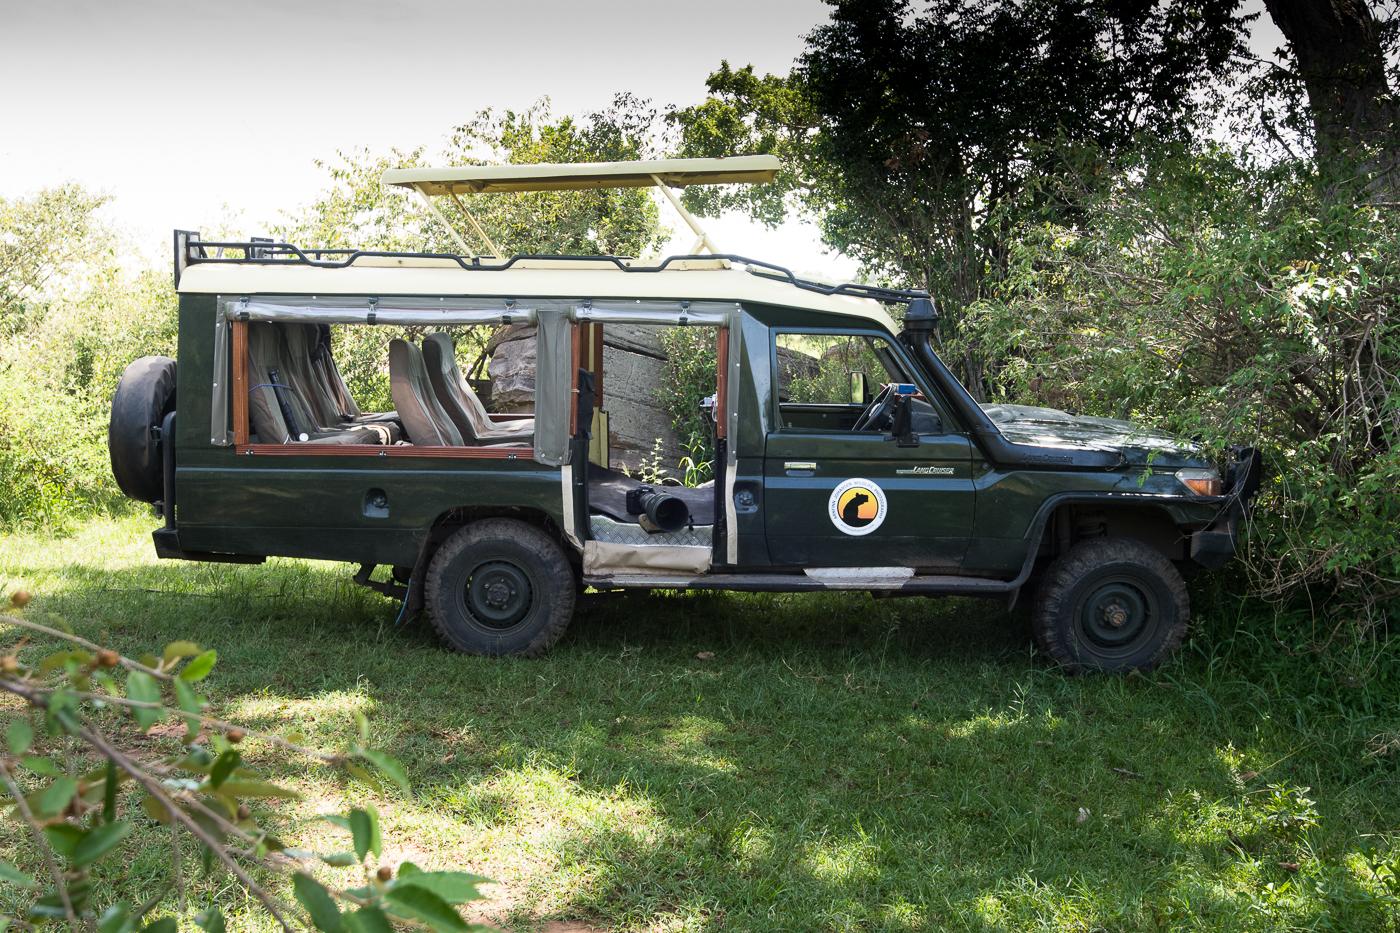 Modified Landcruiser - Img 3 - Oltepesi Tented Safari Camp